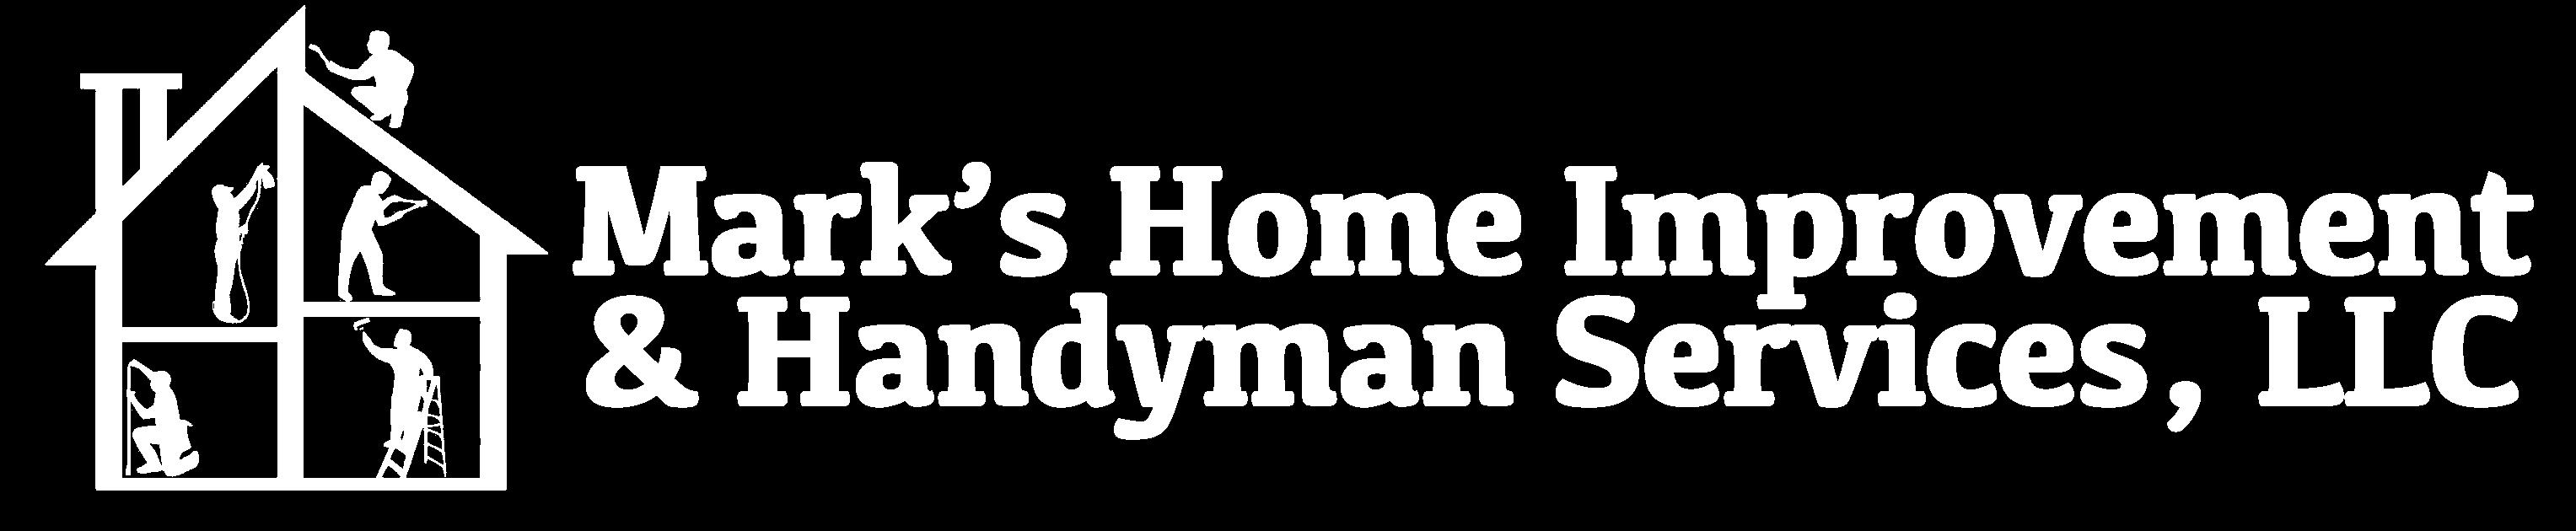 Marks Home Improvement